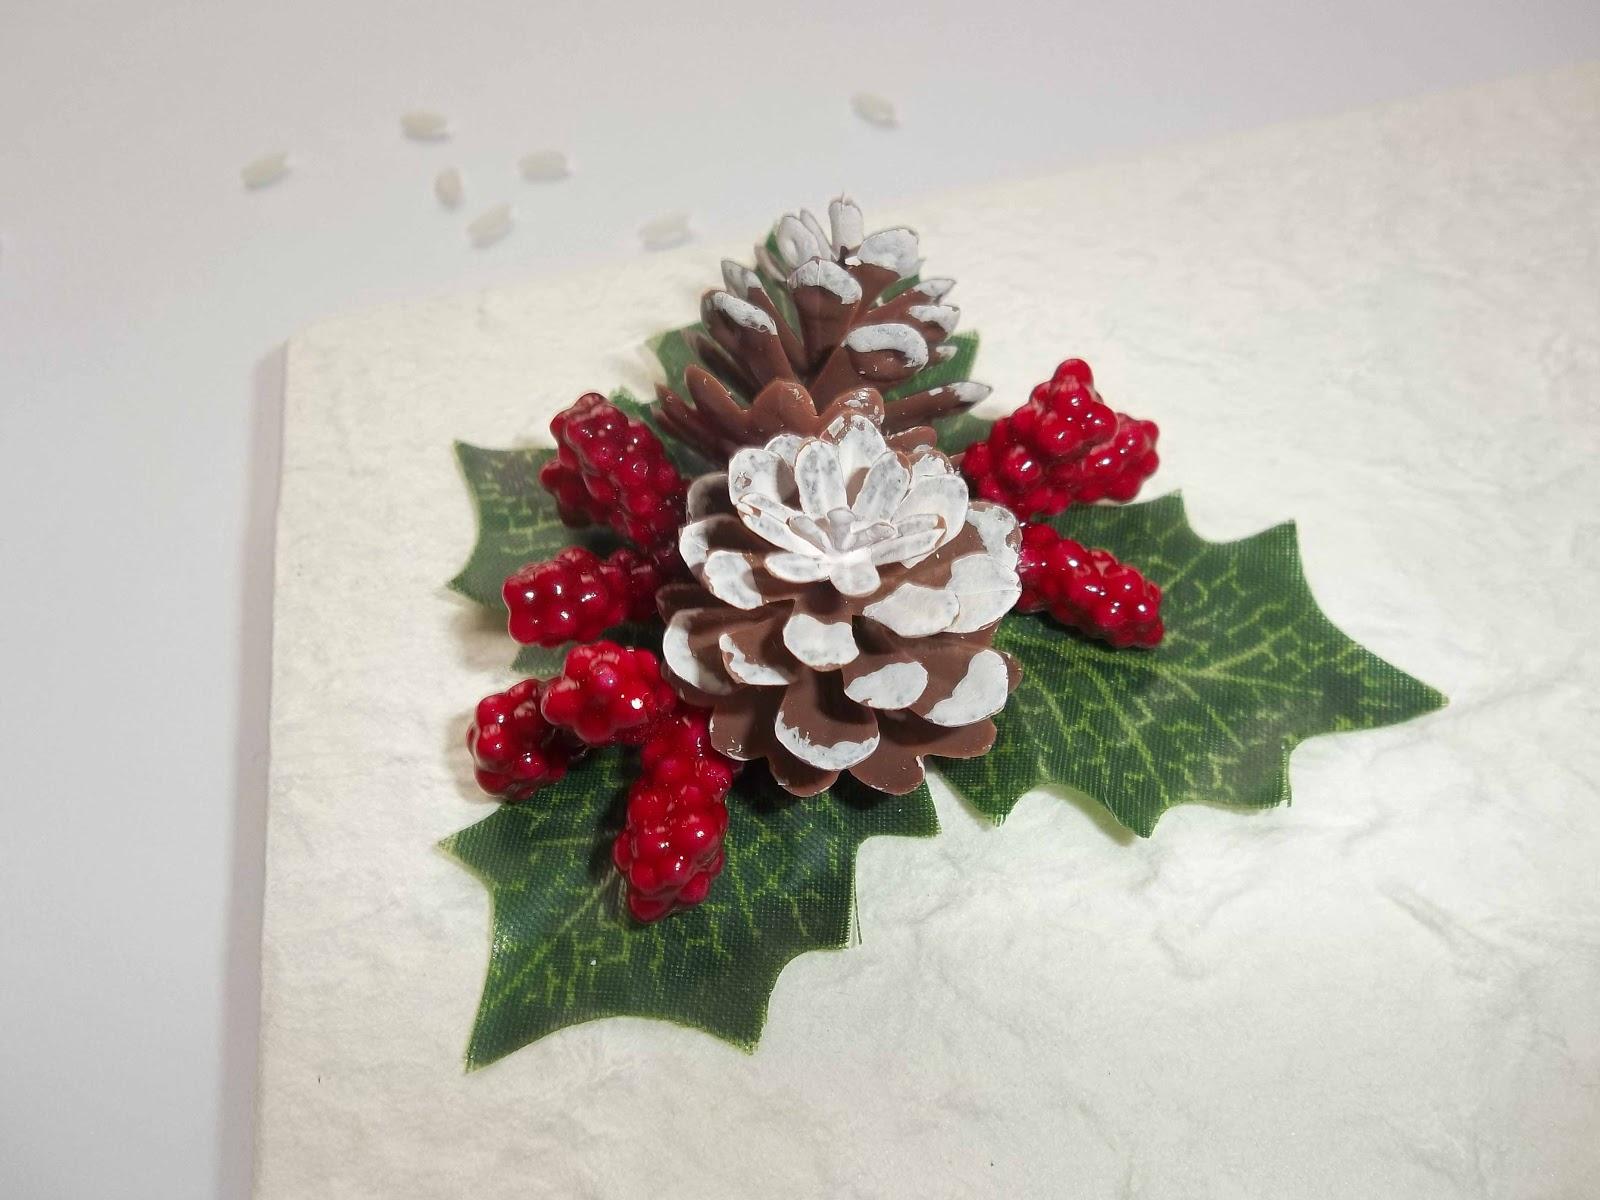 Matrimonio Tema Inverno : Sara crea matrimonio tema inverno guestbook o libro